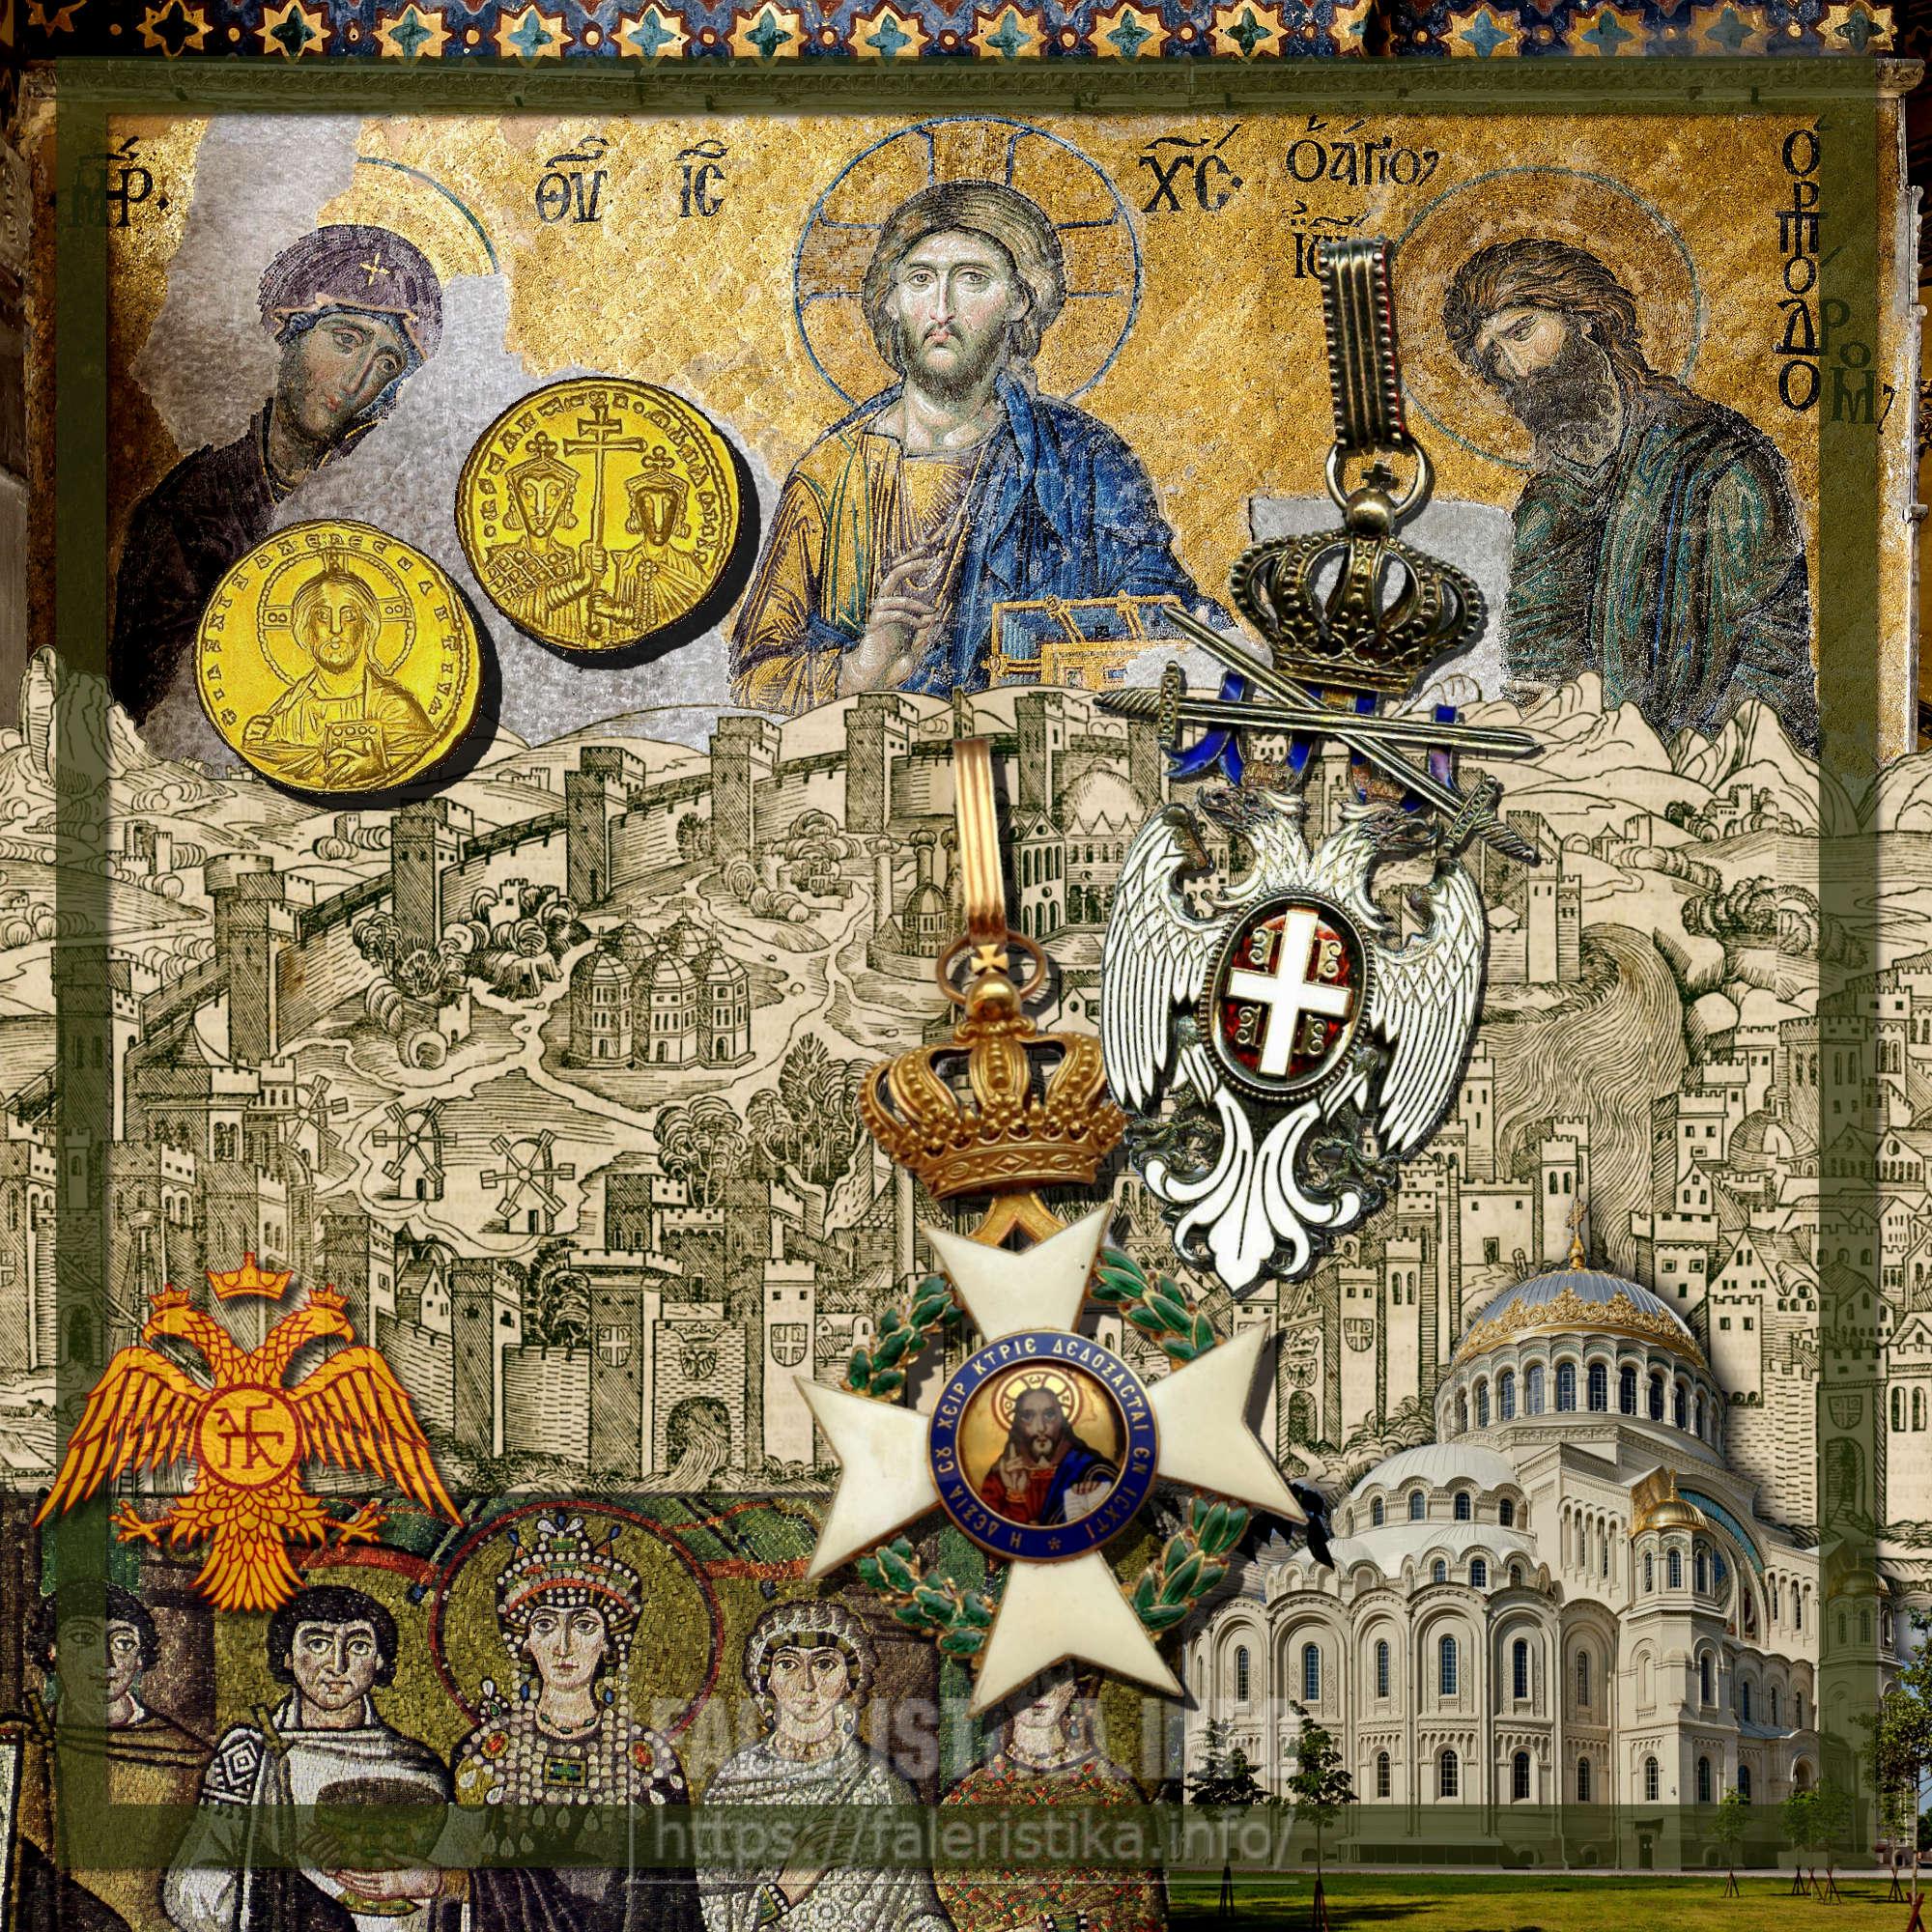 Византийский и неовизантийский стиль. Мозаика, архитектура, вид на Константинополь, монеты, ордена, символика. Влияние на Россию, Грецию, Сербию.